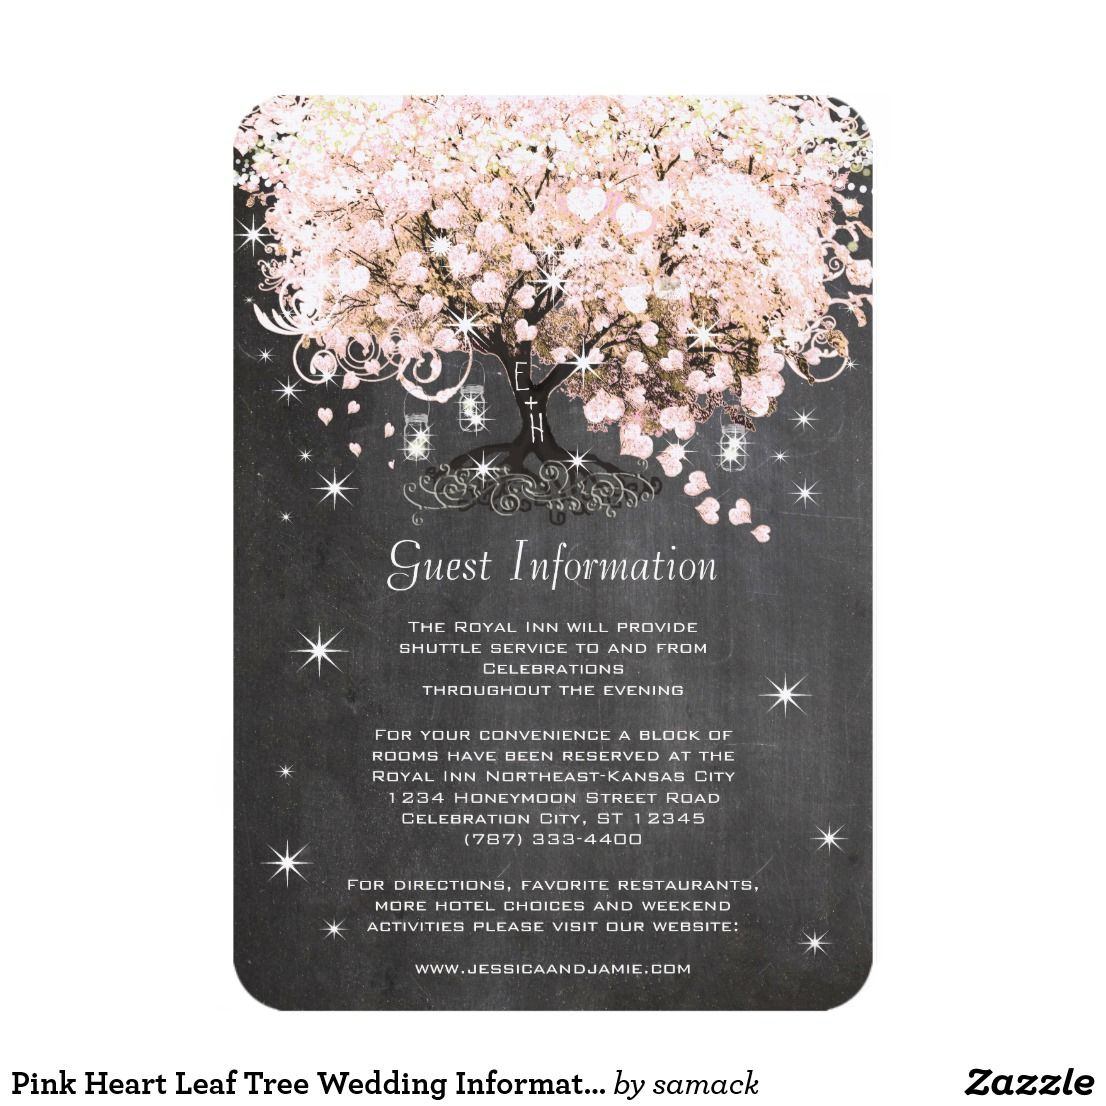 Pink Heart Leaf Tree Wedding Information Card Romantic Rustic Under